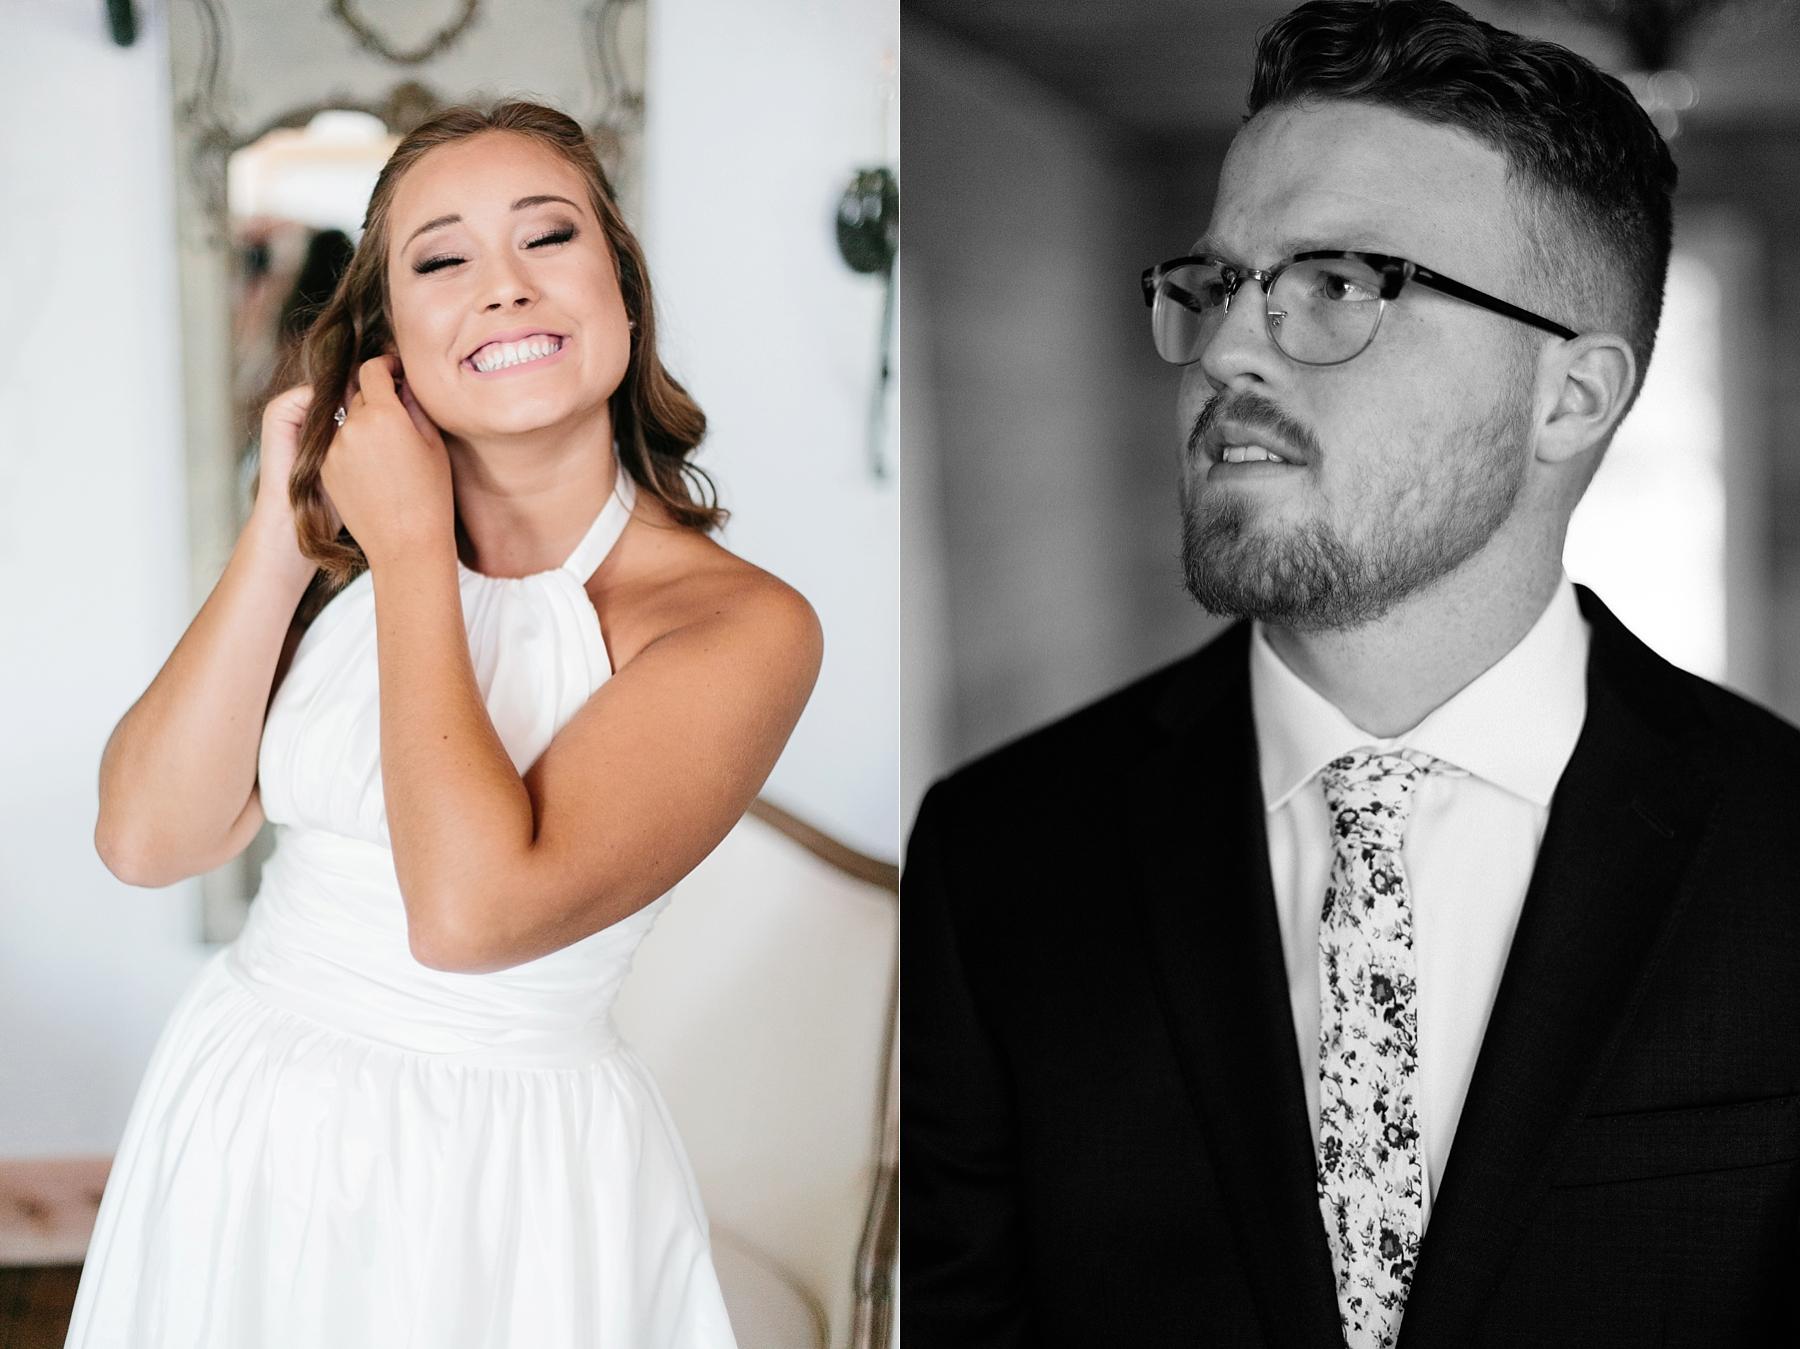 73a18ae673b8 Lauren + Jacob __ Floral Ties, lavender + blush tones, boho bridesmaids  dresses wedding at Chapel Creek Ranch by North Texas Wedding Photographer  Rachel ...